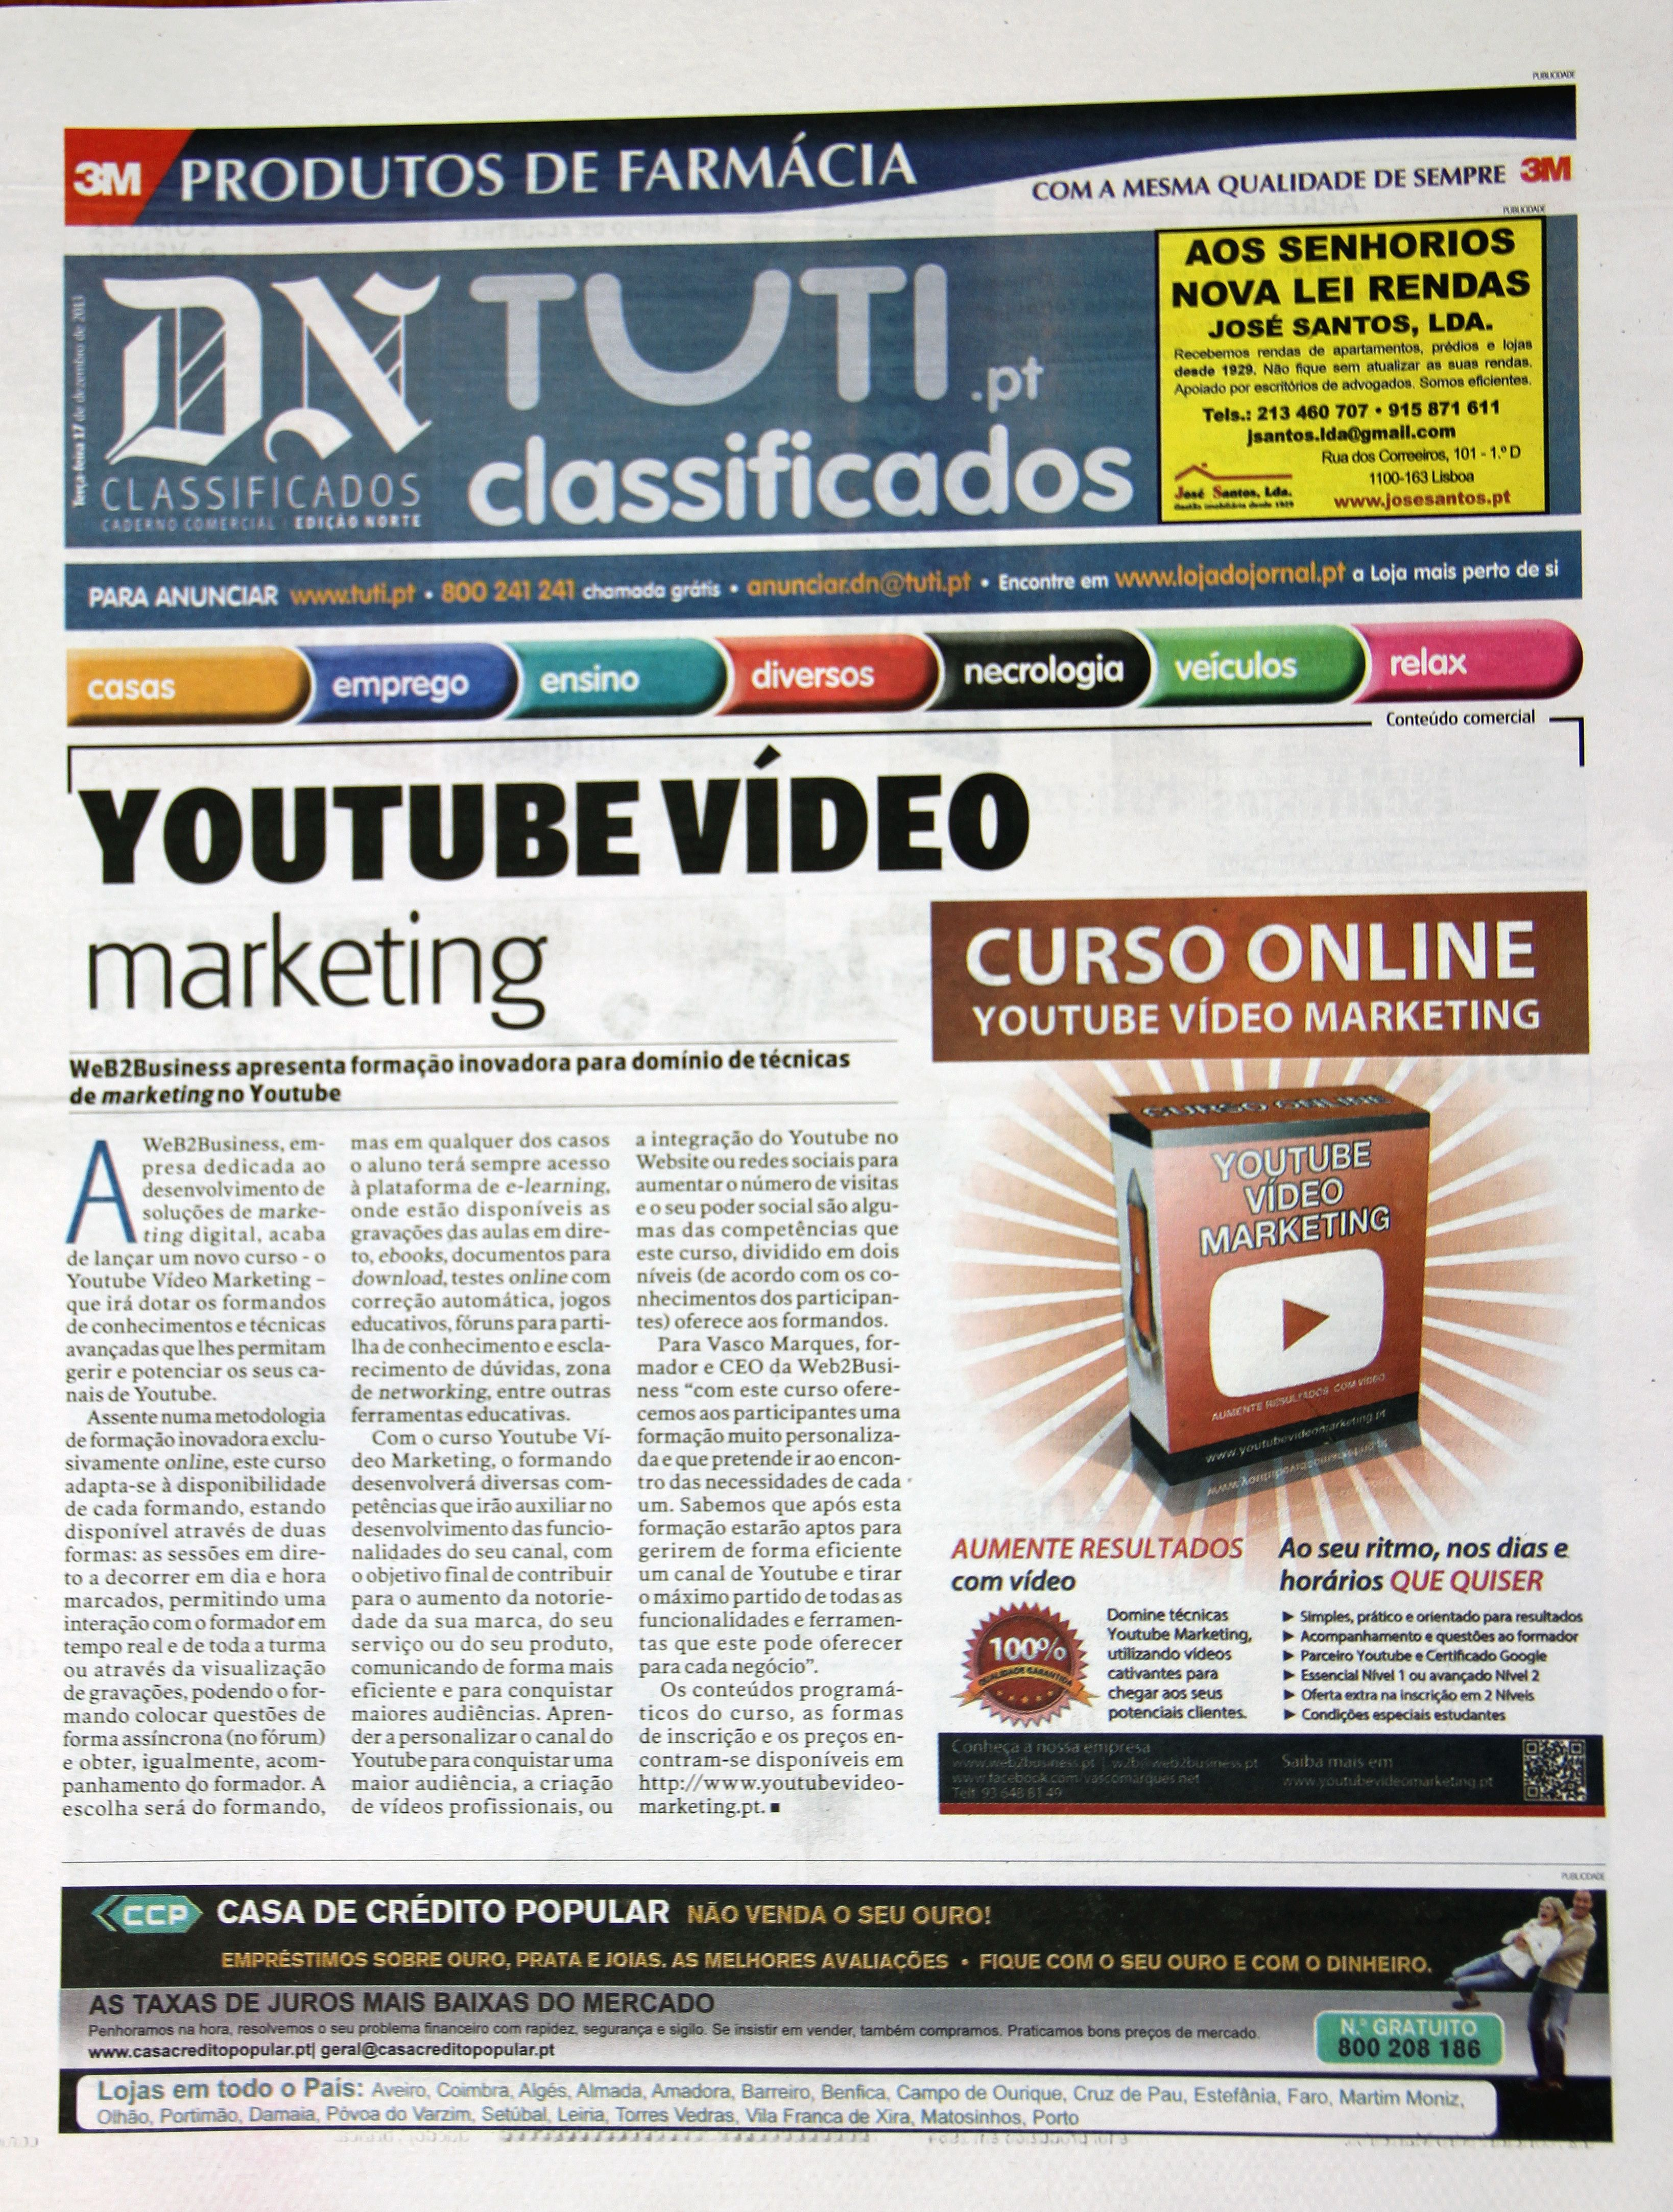 Módulos Video marketing youtube, Infographic marketing